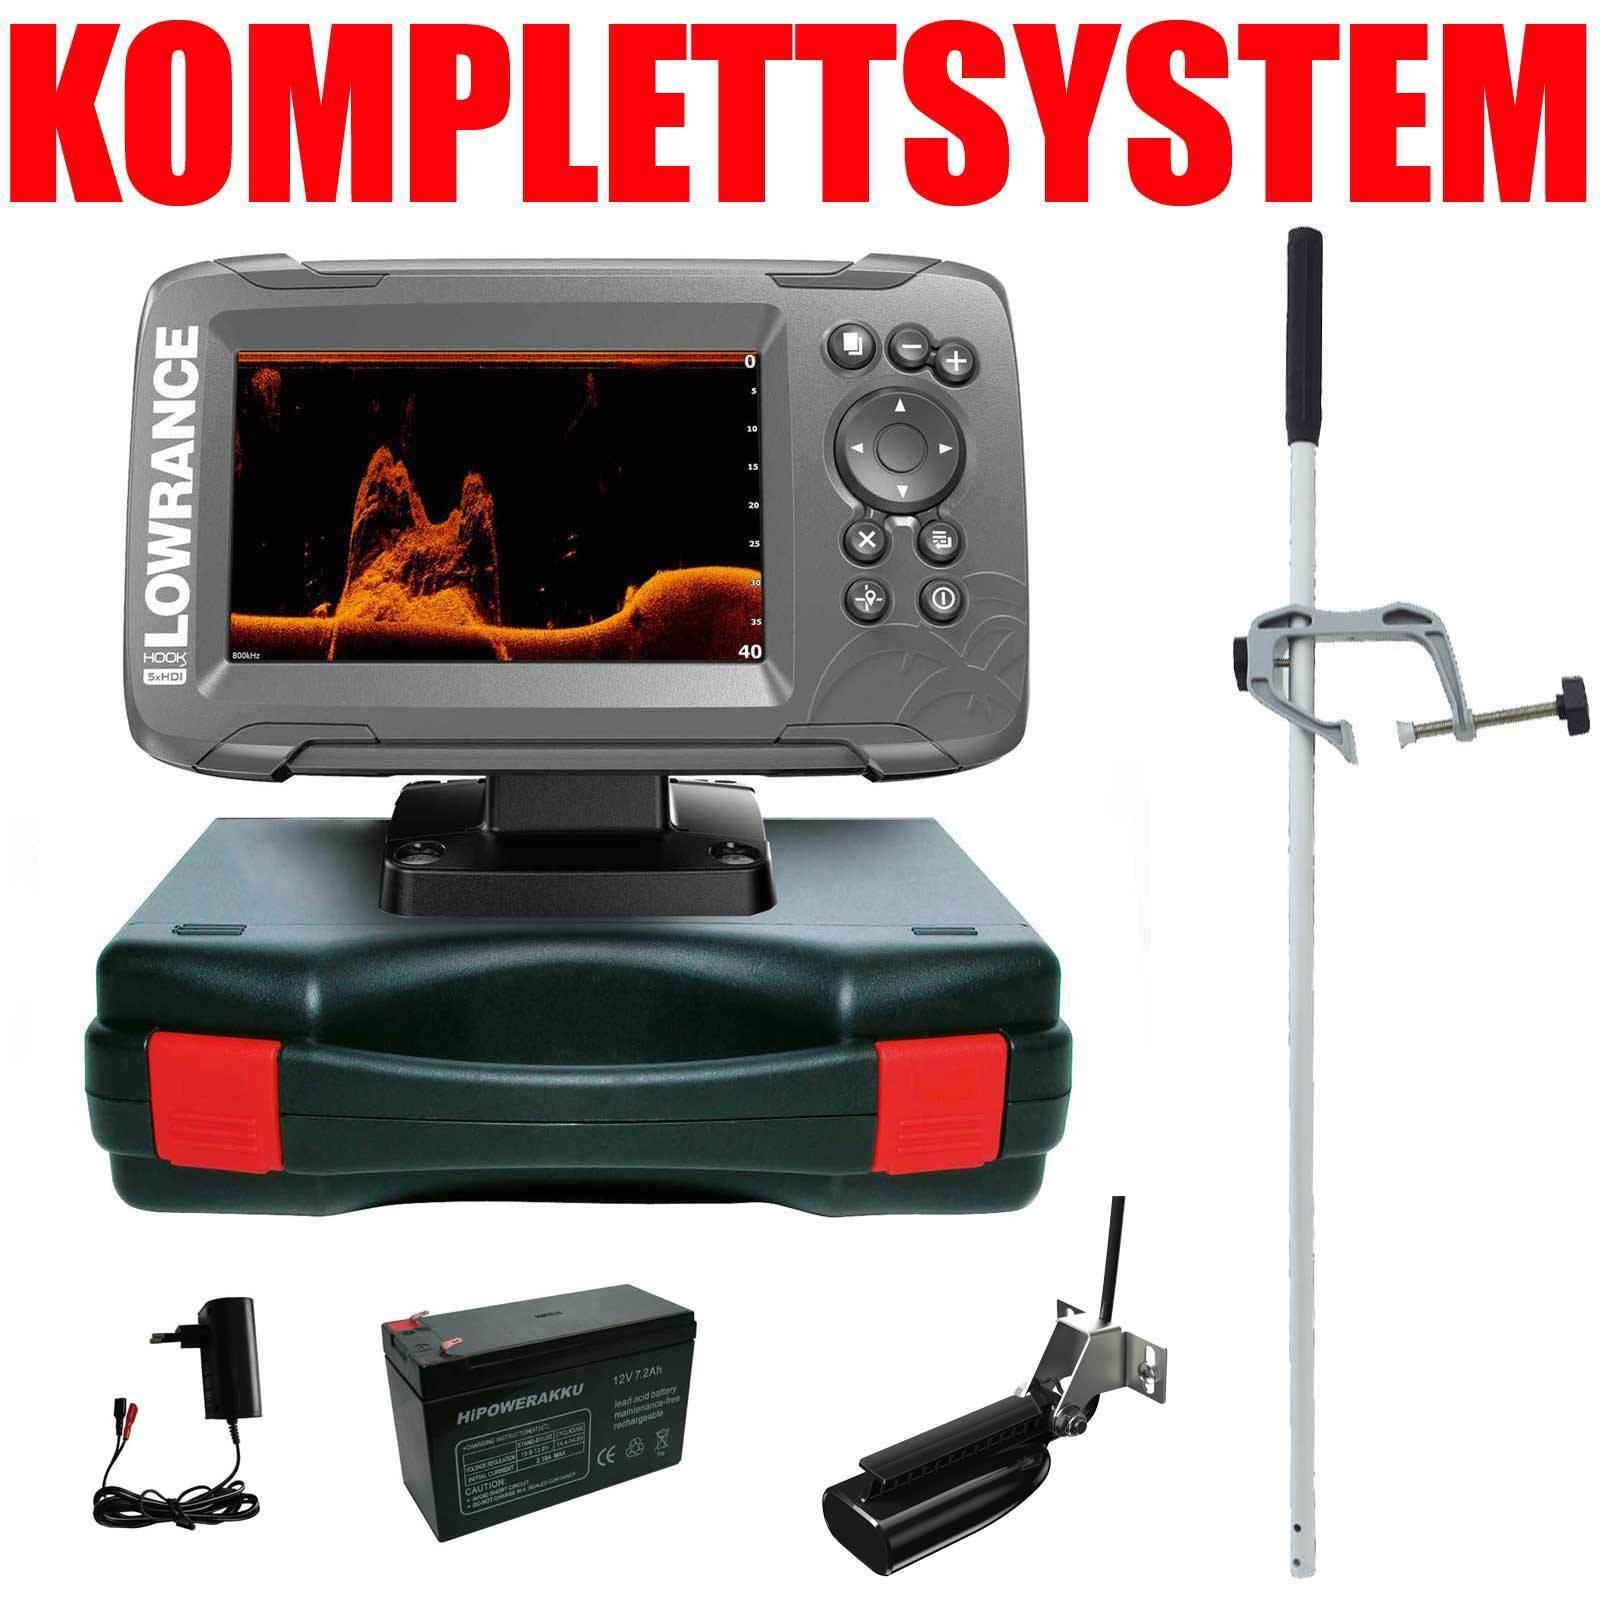 Niedrigrance Echolot GPS Portabel Master Edition - SplitShot Hook2 5x SplitShot - HDI GPS 564e22